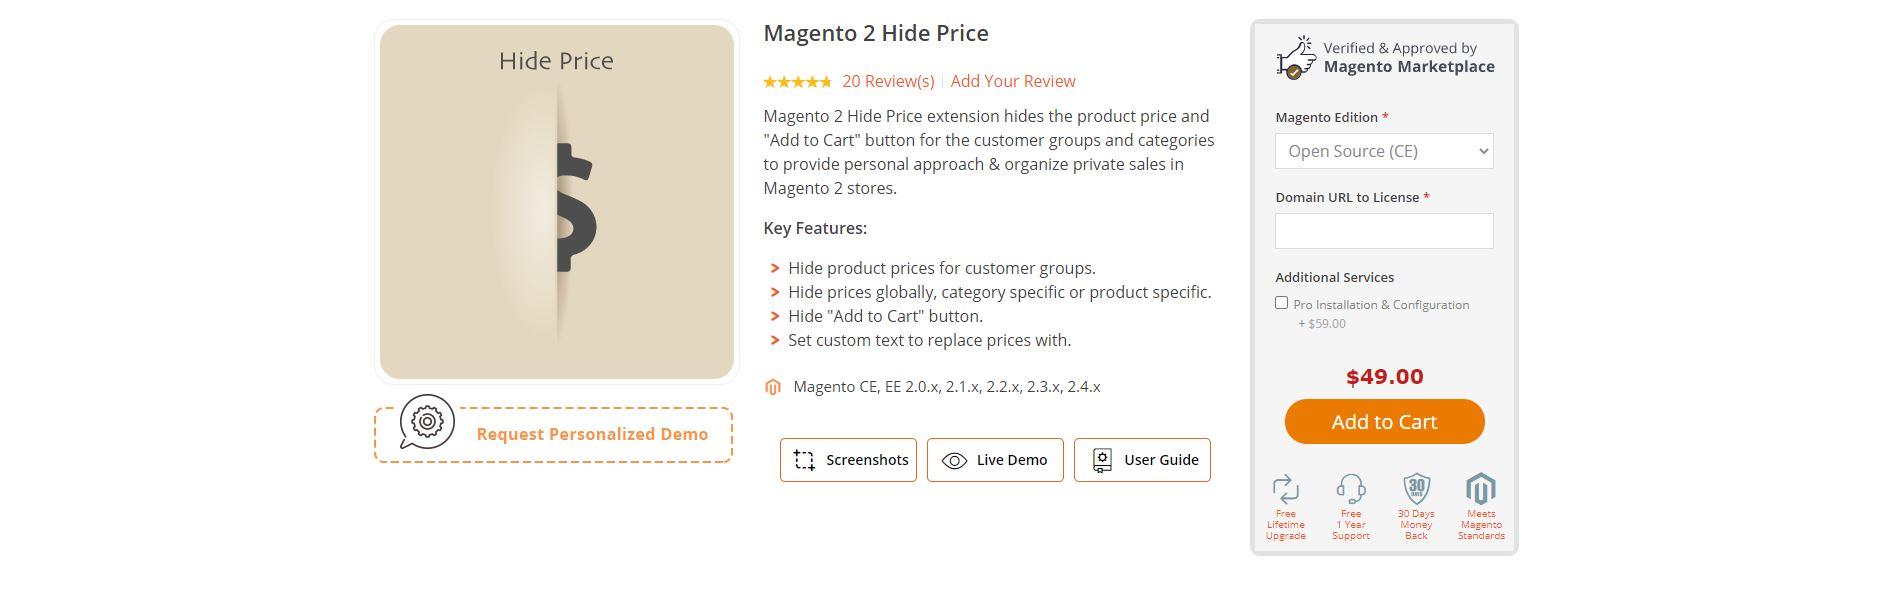 Magento hide price extension